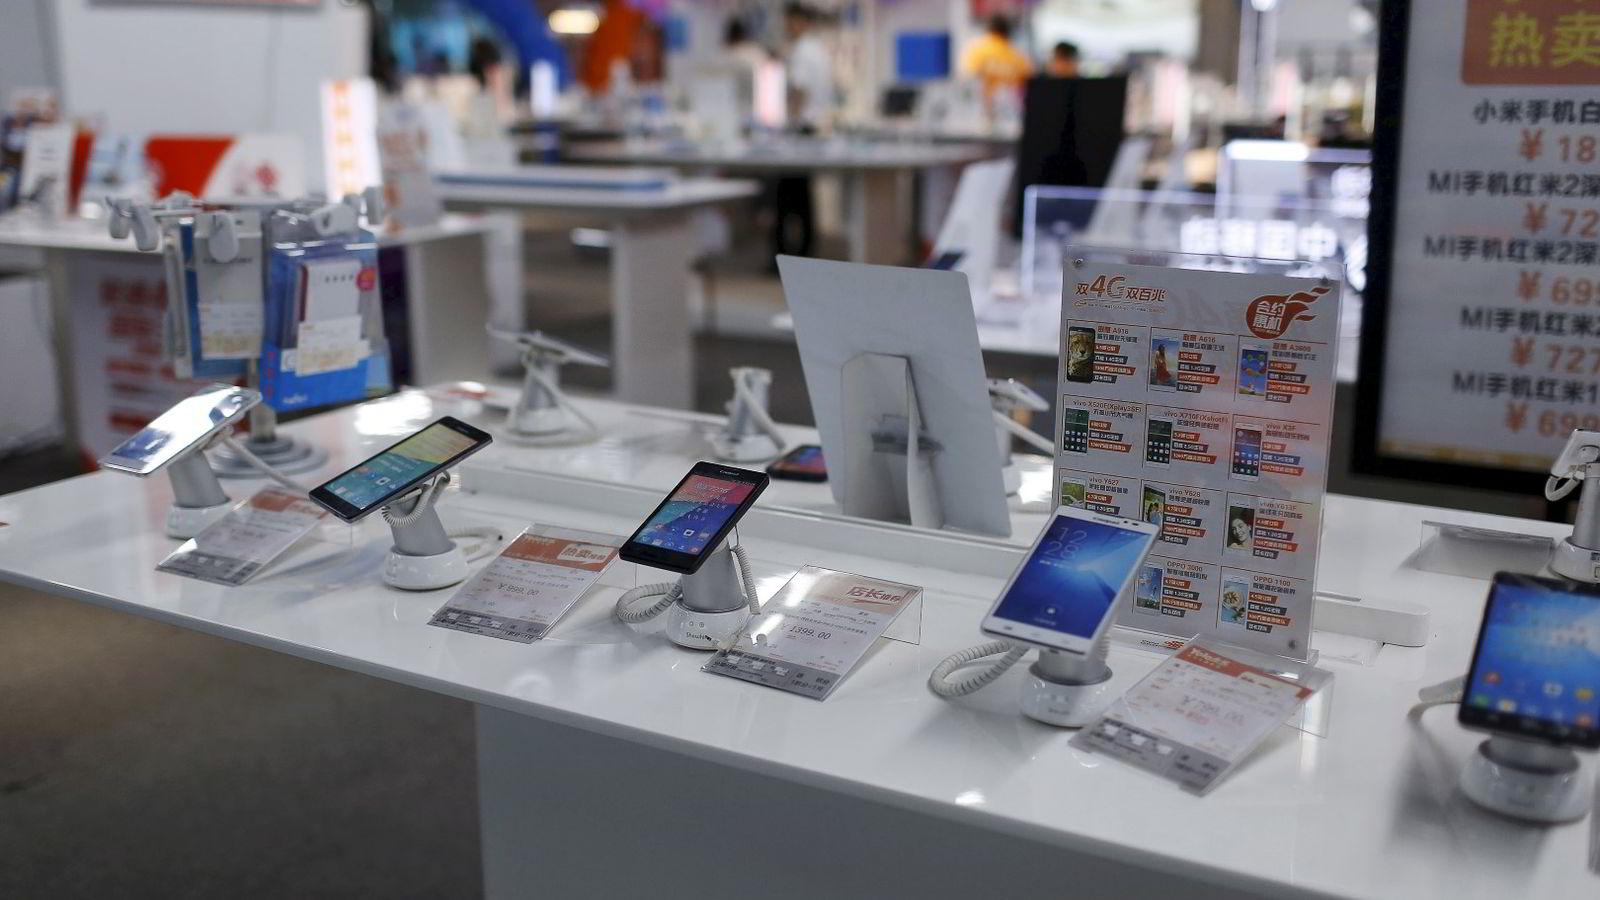 Mens mange smarttelefonprodusenter sliter, vokser kinesiske Oppo i rekordfart. Foto: Aly Song/Reuters/NTB scanpix